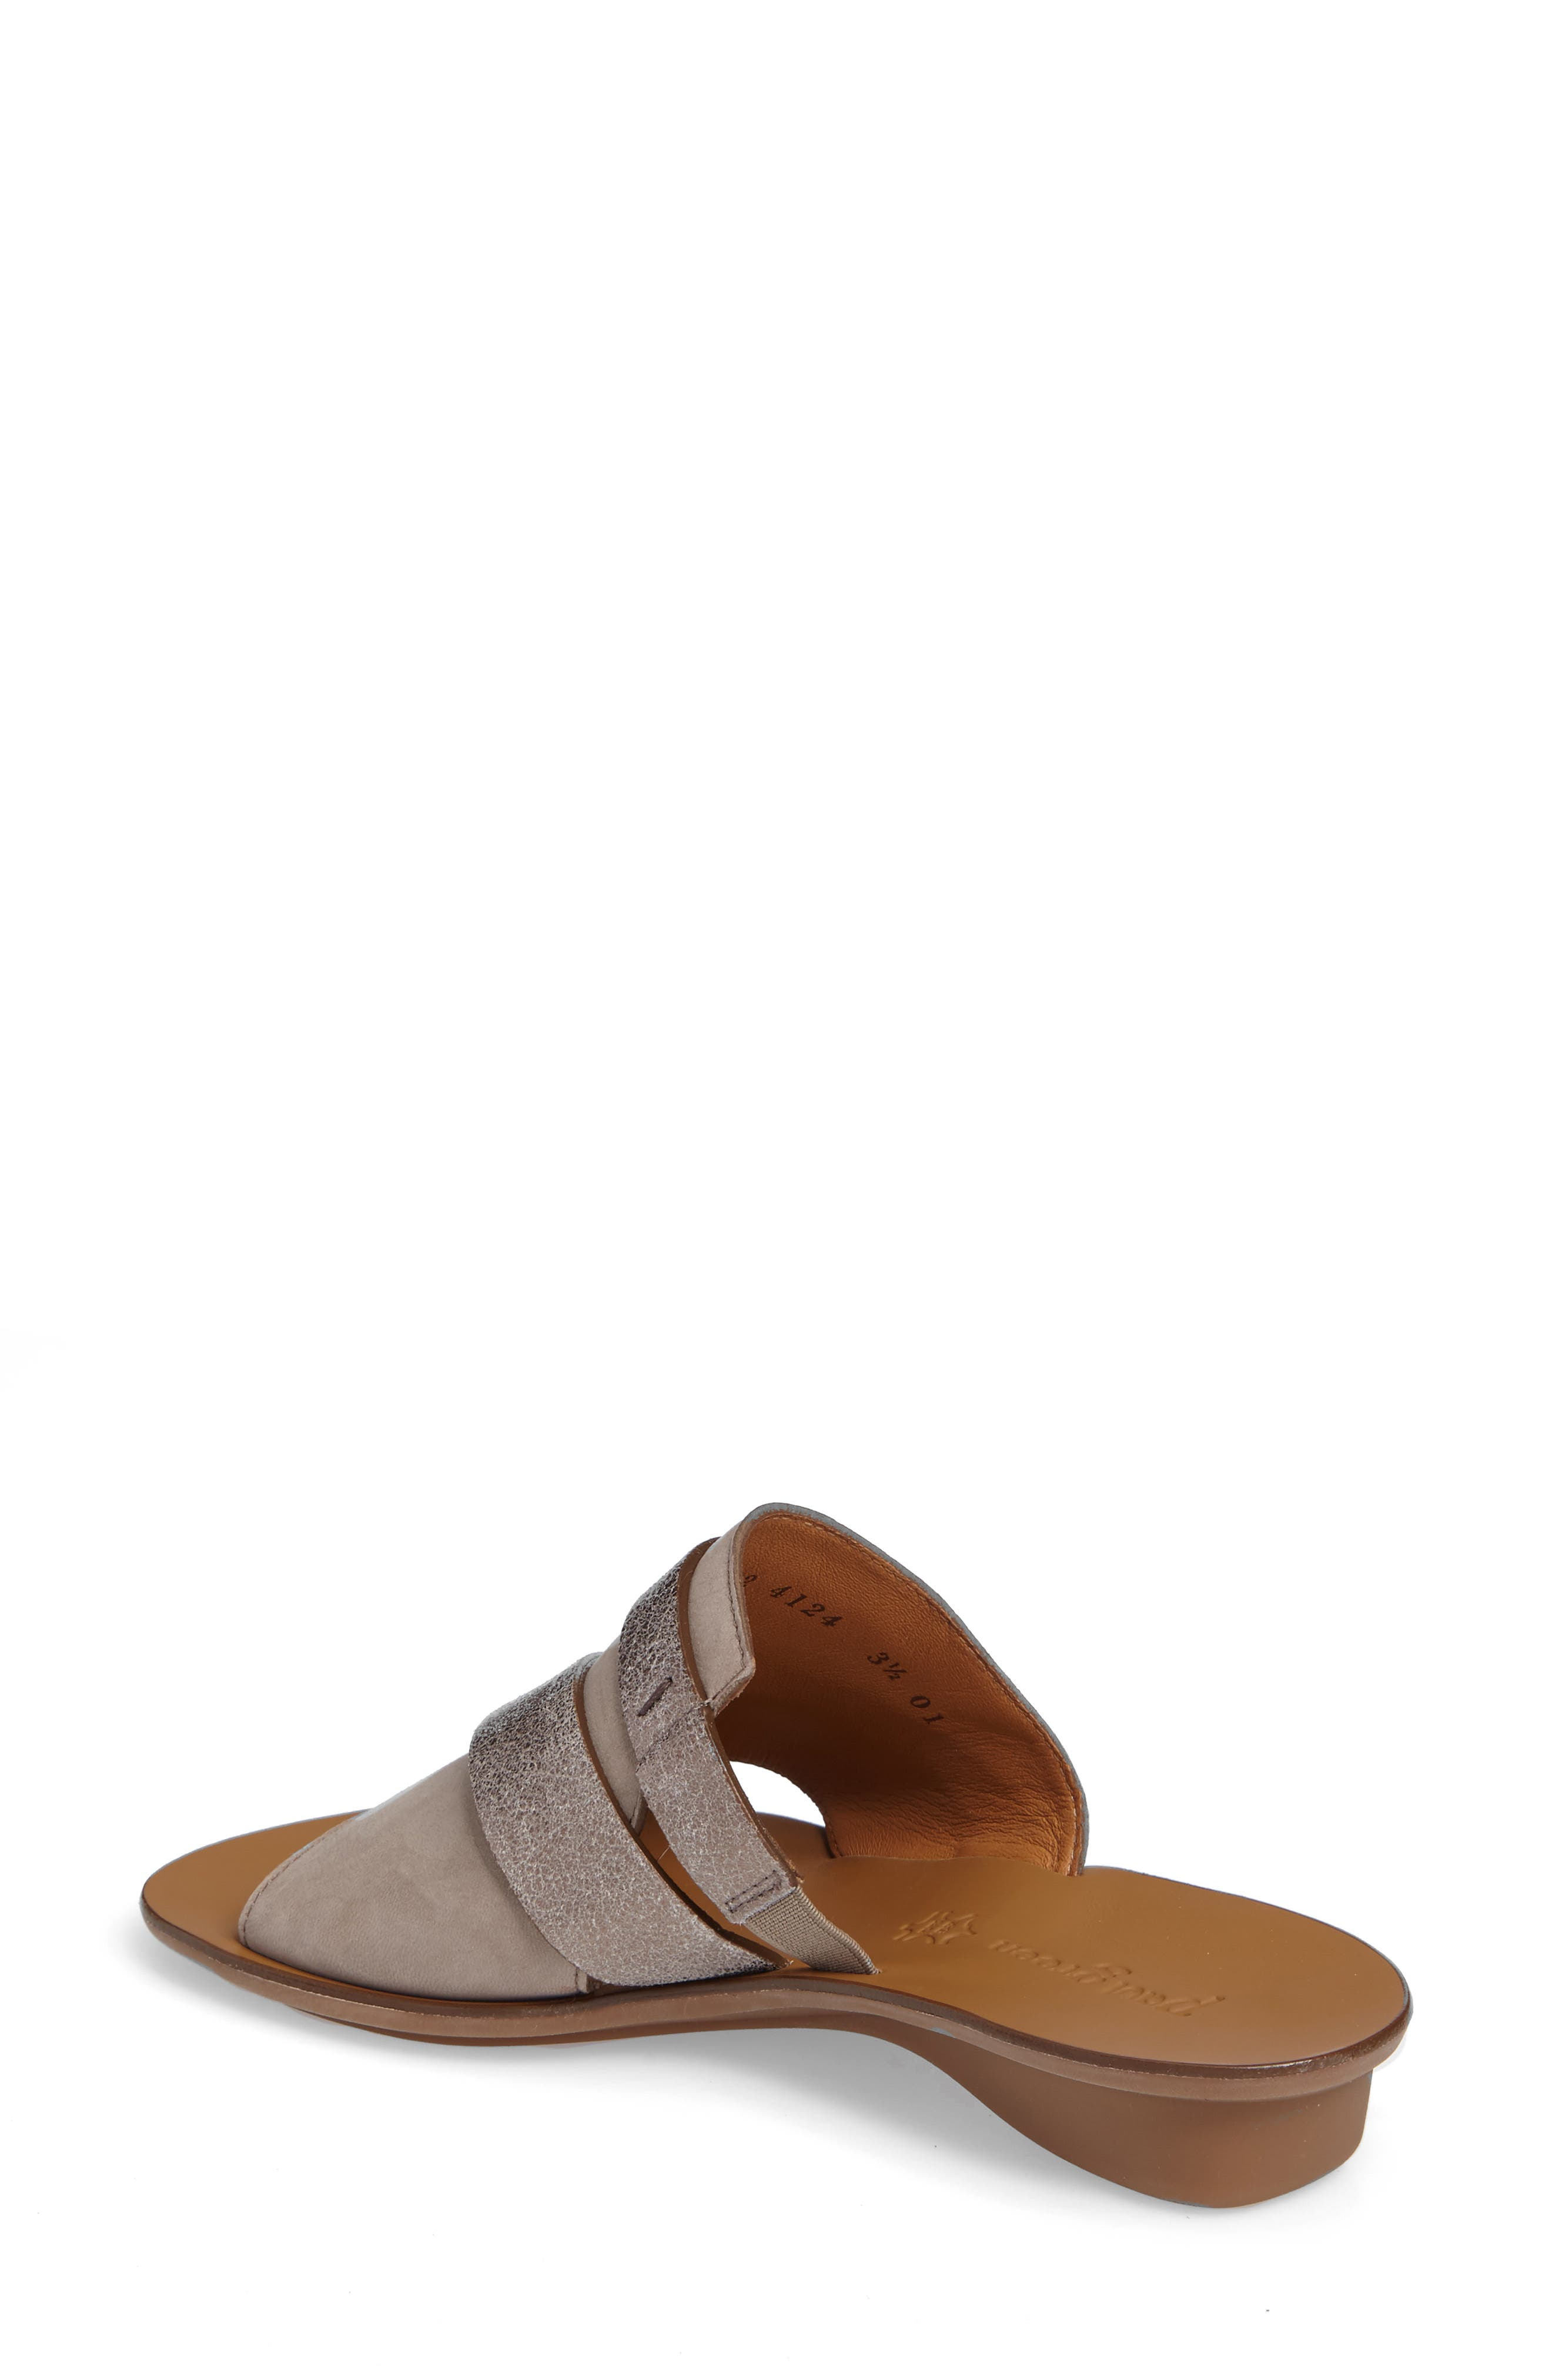 Alternate Image 2  - Paul Green 'Bayside' Leather Sandal (Women)